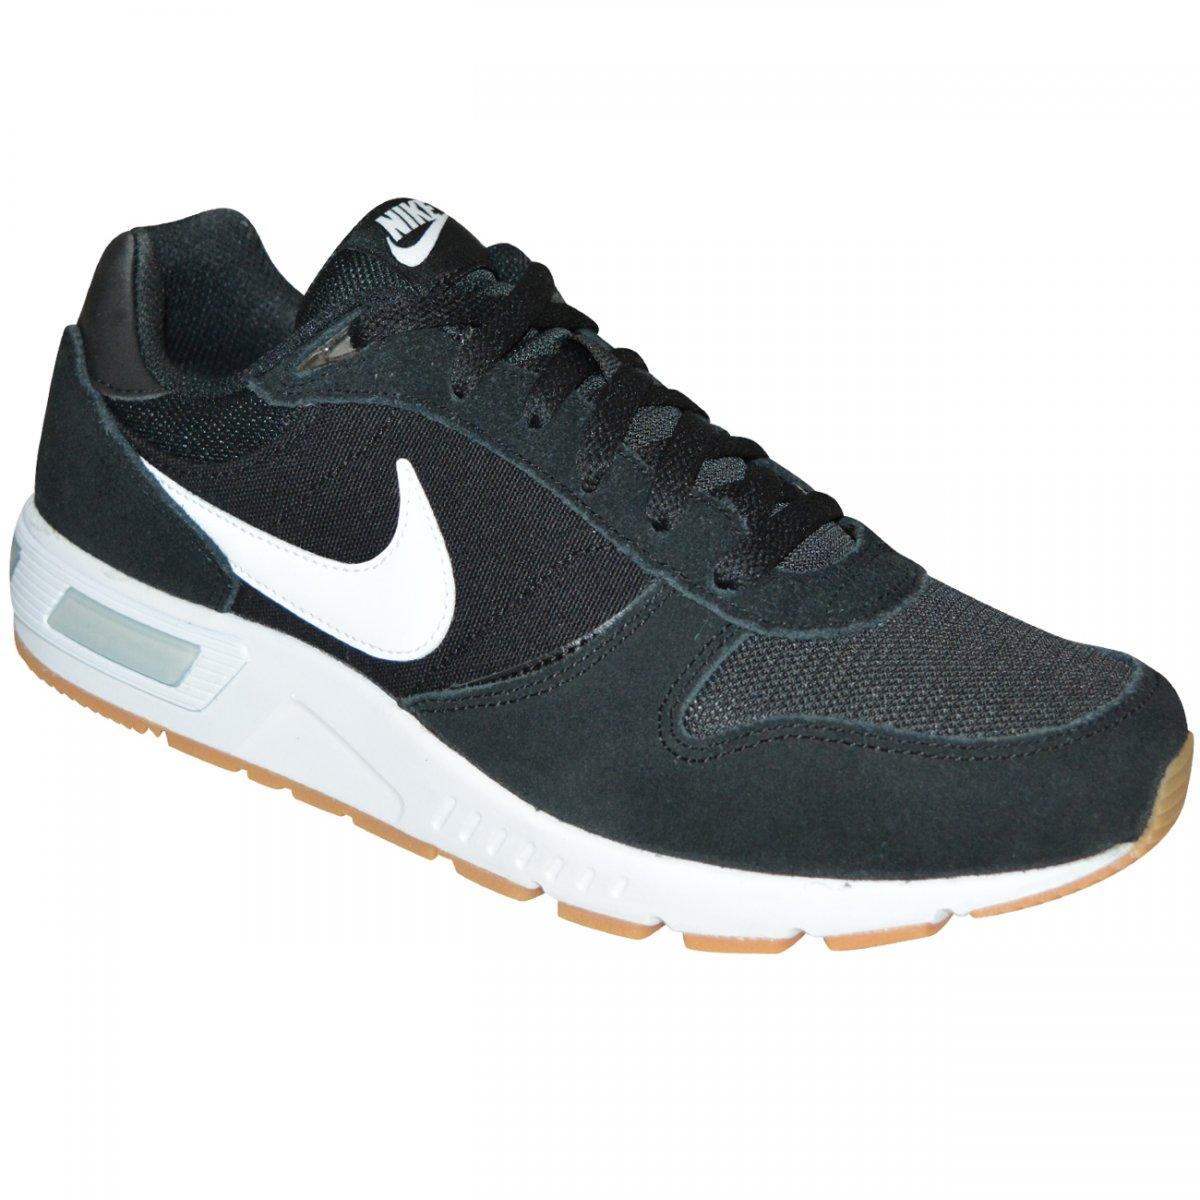 47b72d4f30 Tenis Nike Nightgazer 644402 006 - Preto branco - Chuteira Nike ...